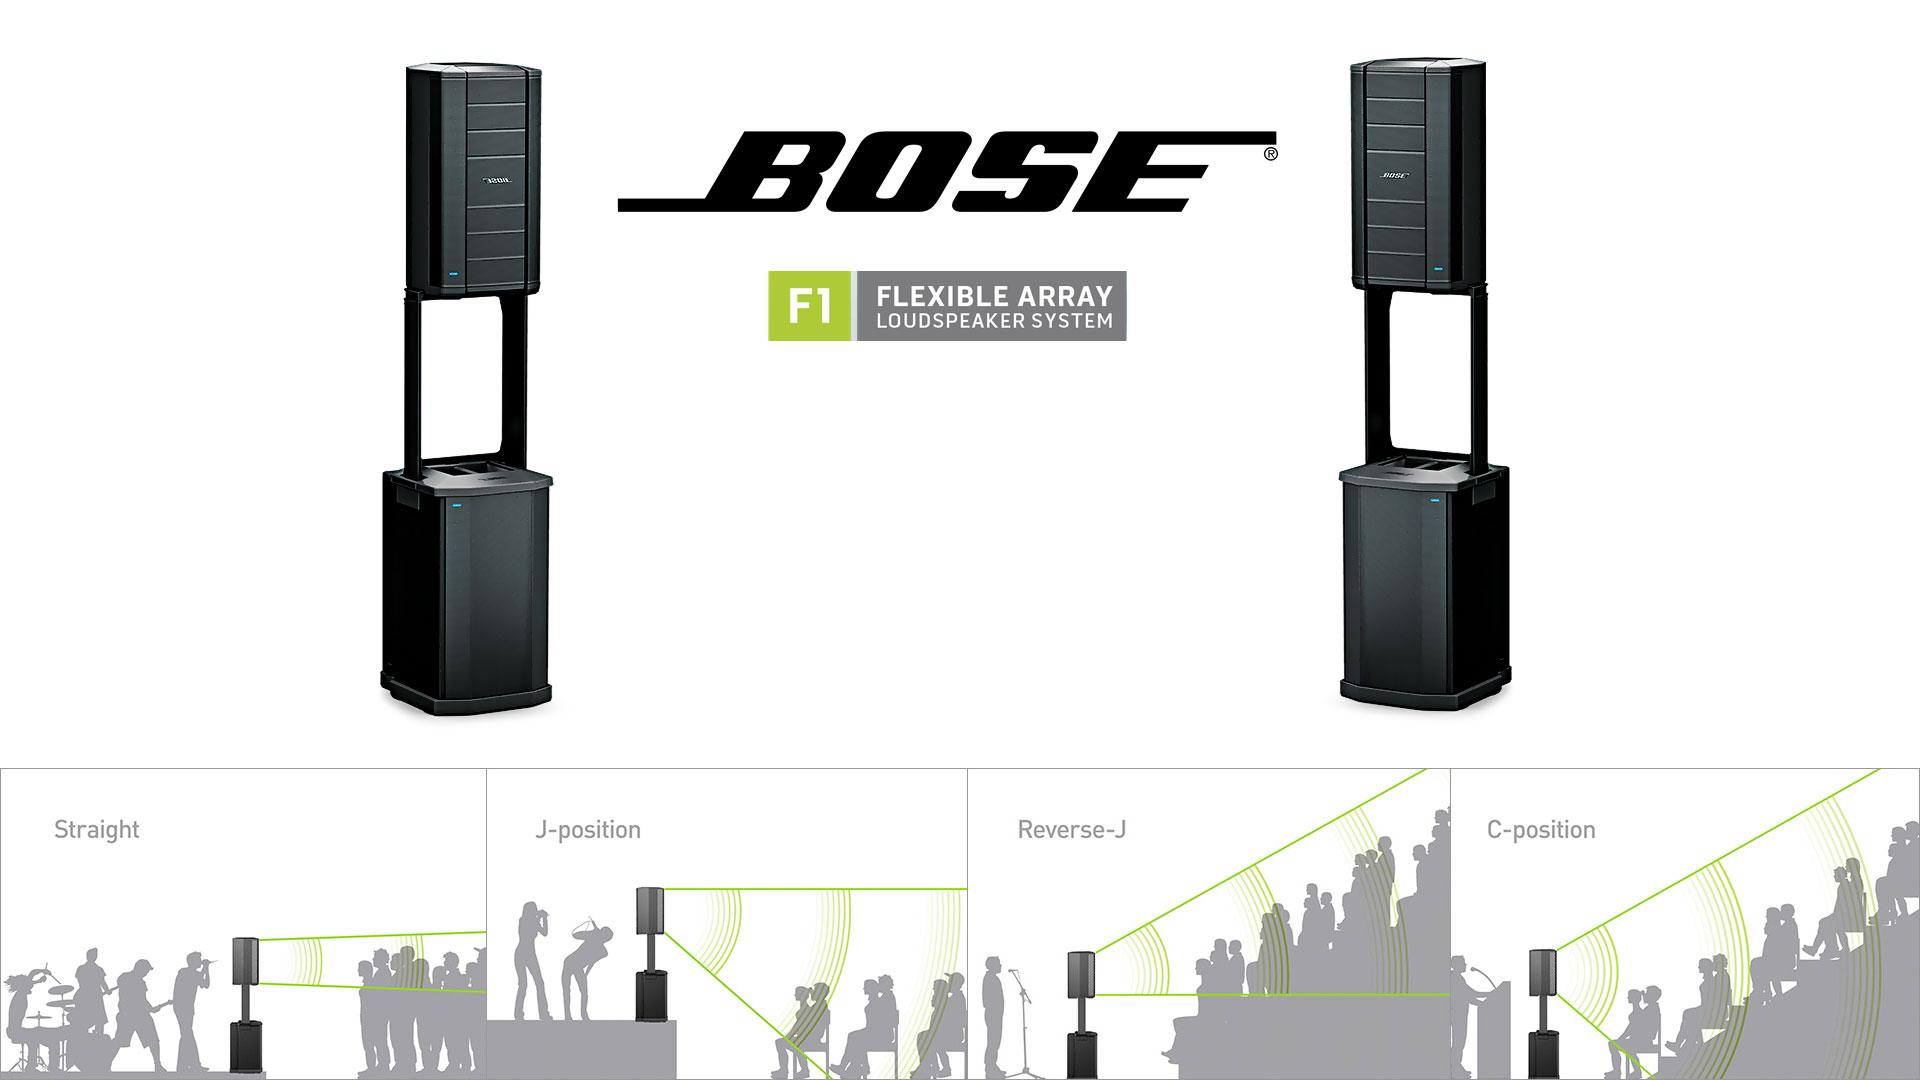 bose f1 2 BOSE F1 Flexibilný ARRAY zvukový systém